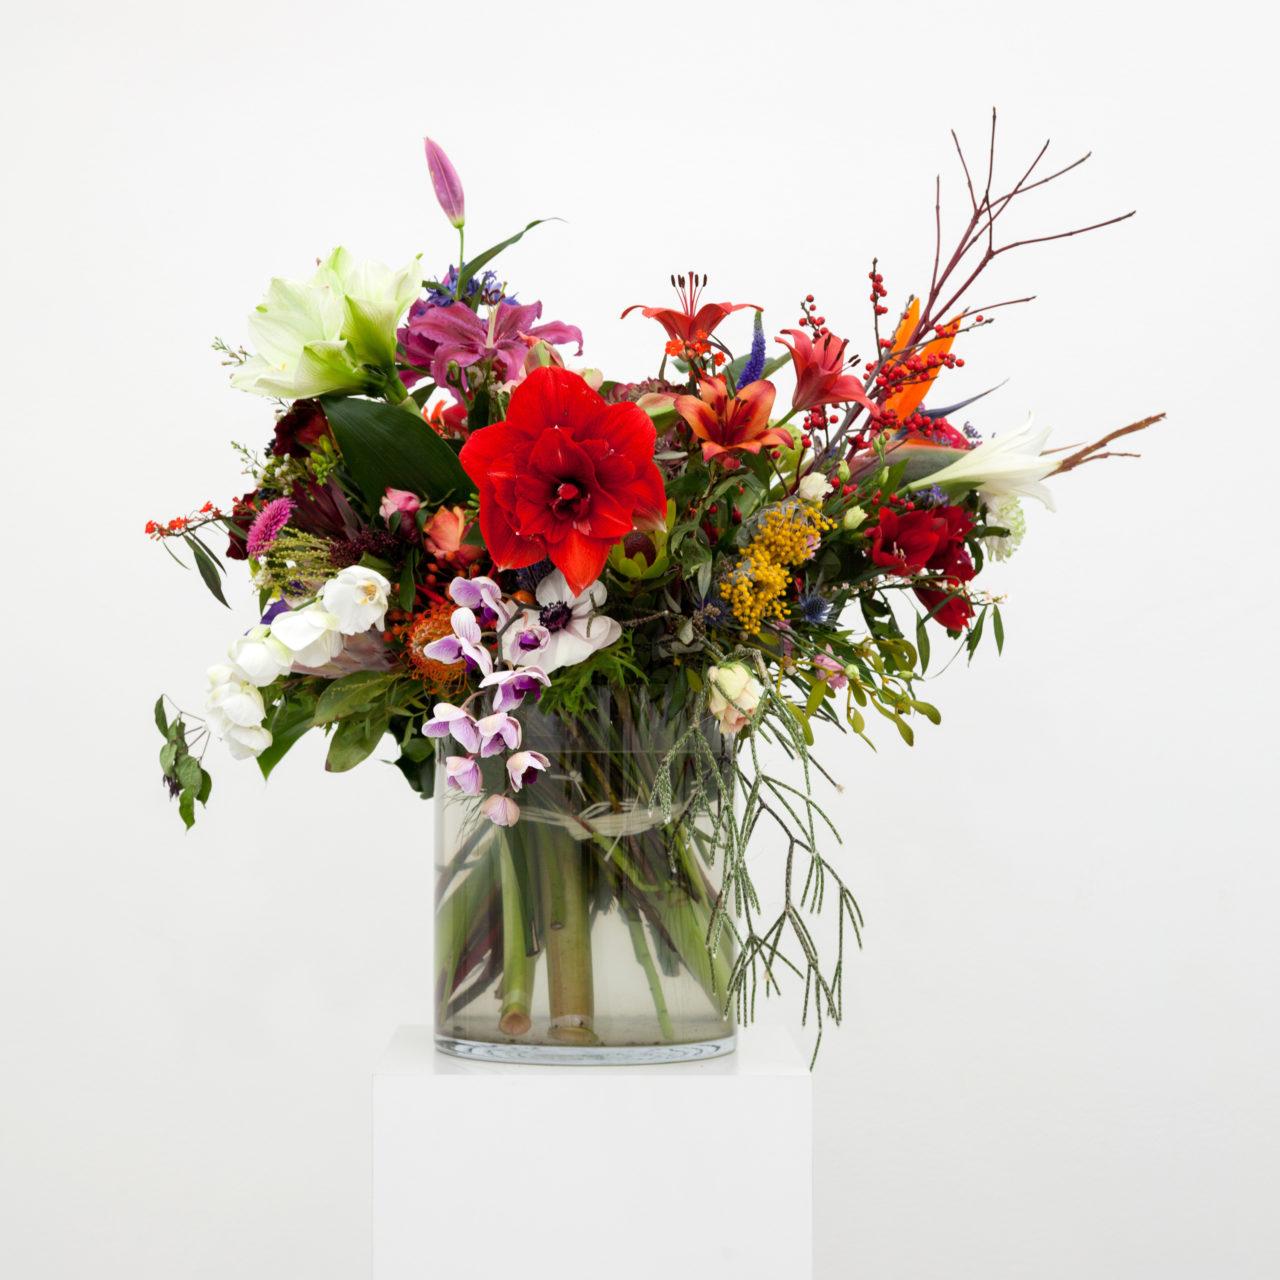 Willem de Rooij, Bouquet V (2010)